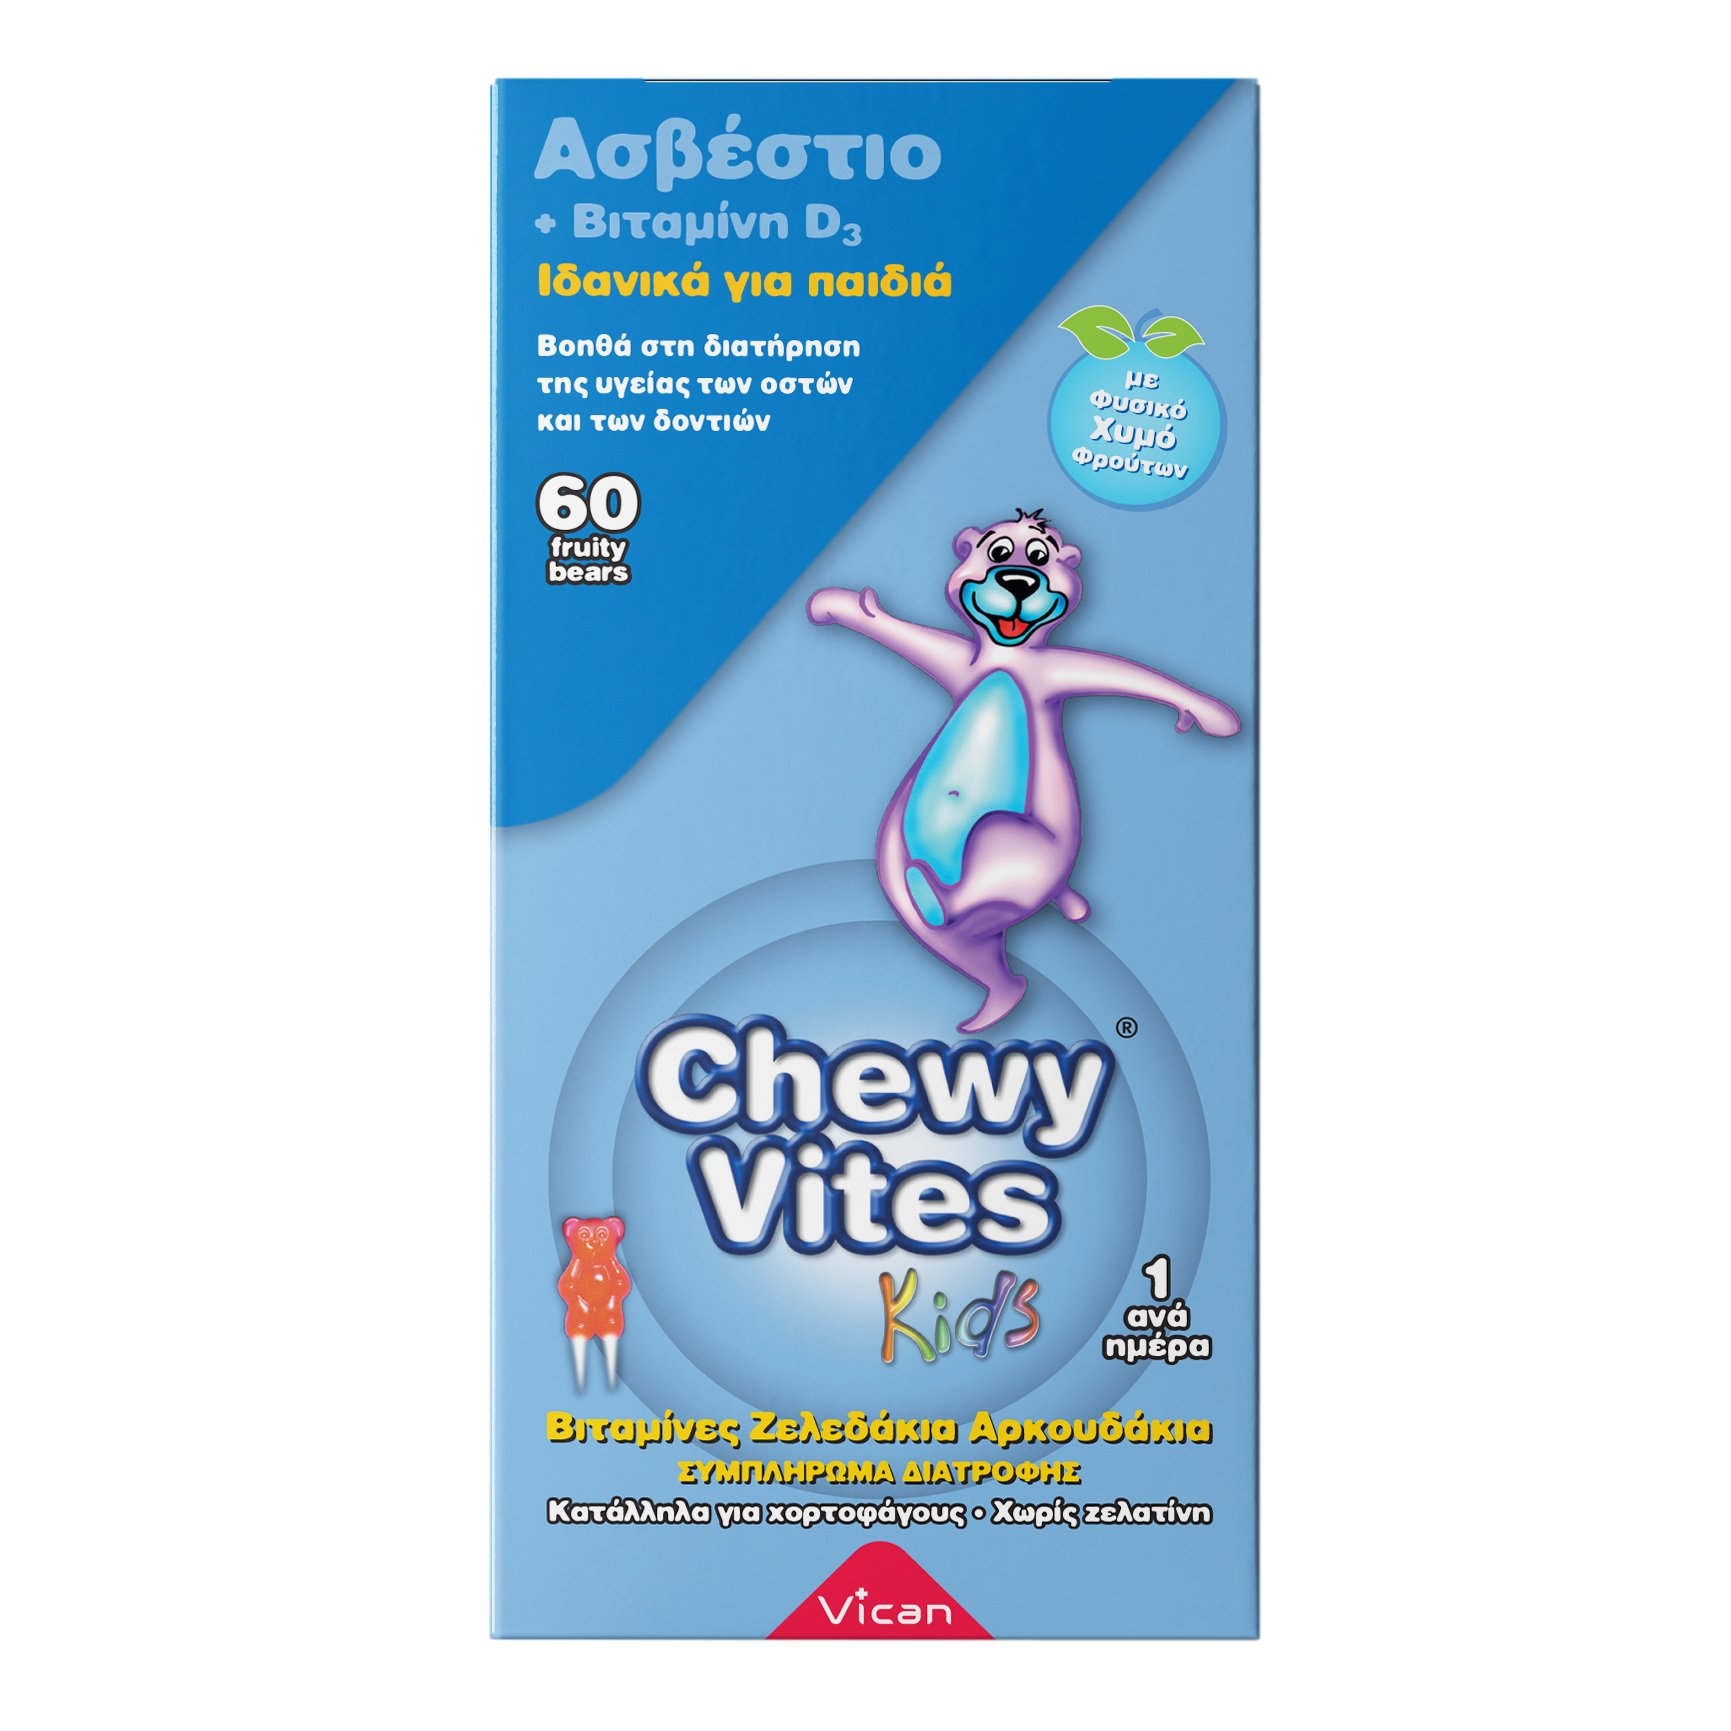 Chewy Vites Kids Calcium +Vitamin D3 Συμπλήρωμα Διατροφής για Παιδιά Ασβέστιο + Βιταμίνη D3 60Bears Chews